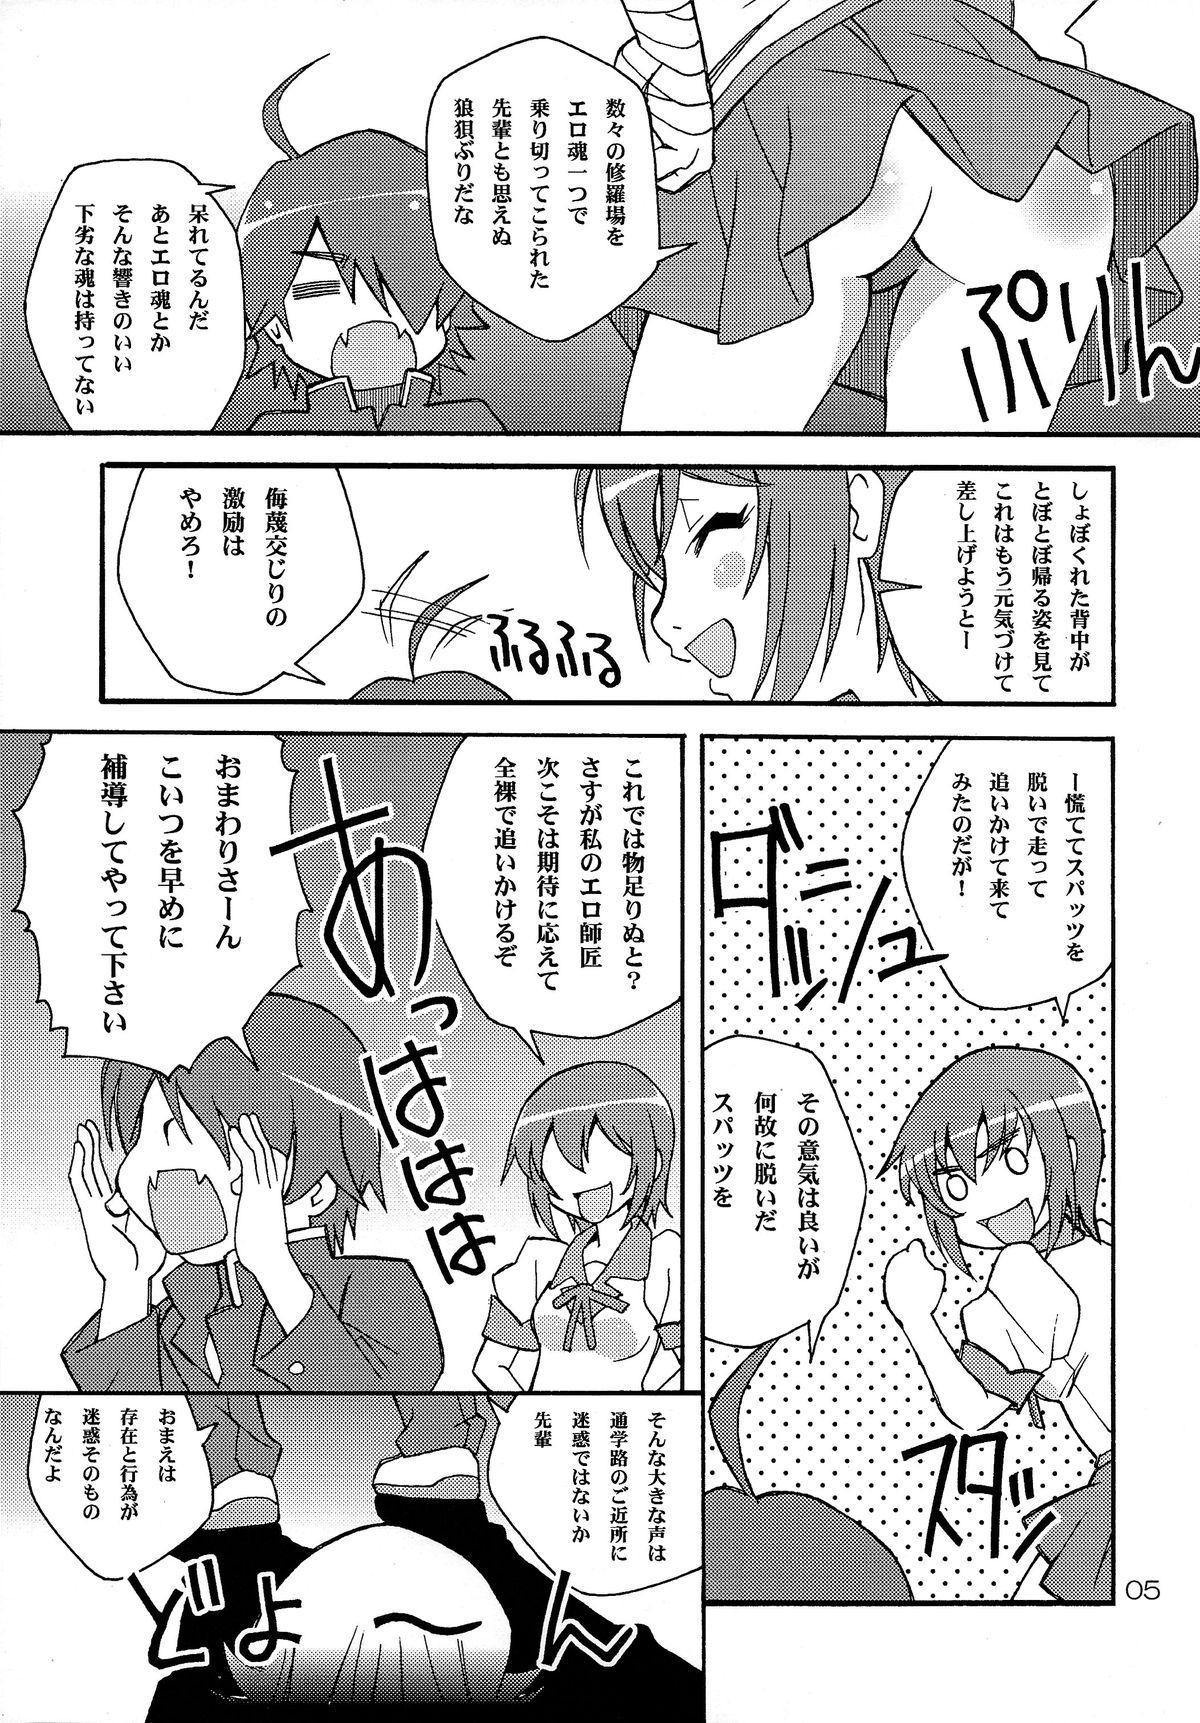 Ha no Monogatari 2014-nen Kanzenban 4